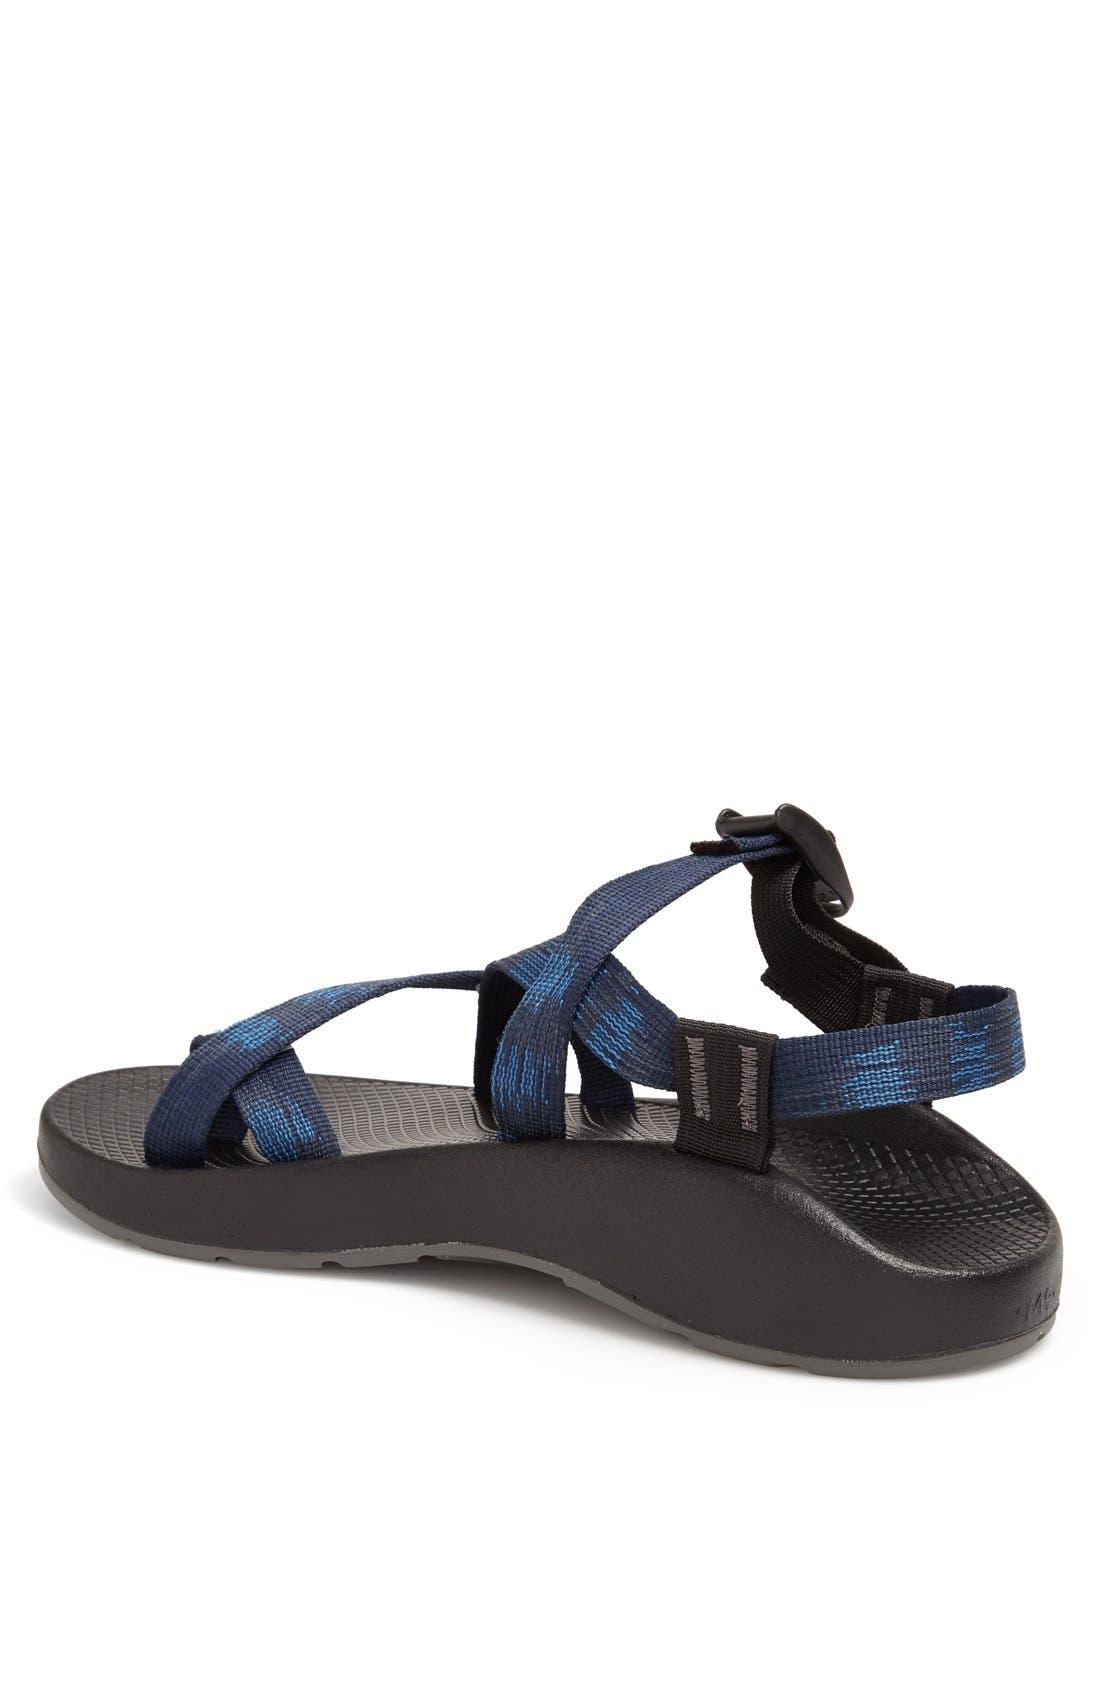 Alternate Image 2  - Chaco 'Z/2 Yampa' Sandal